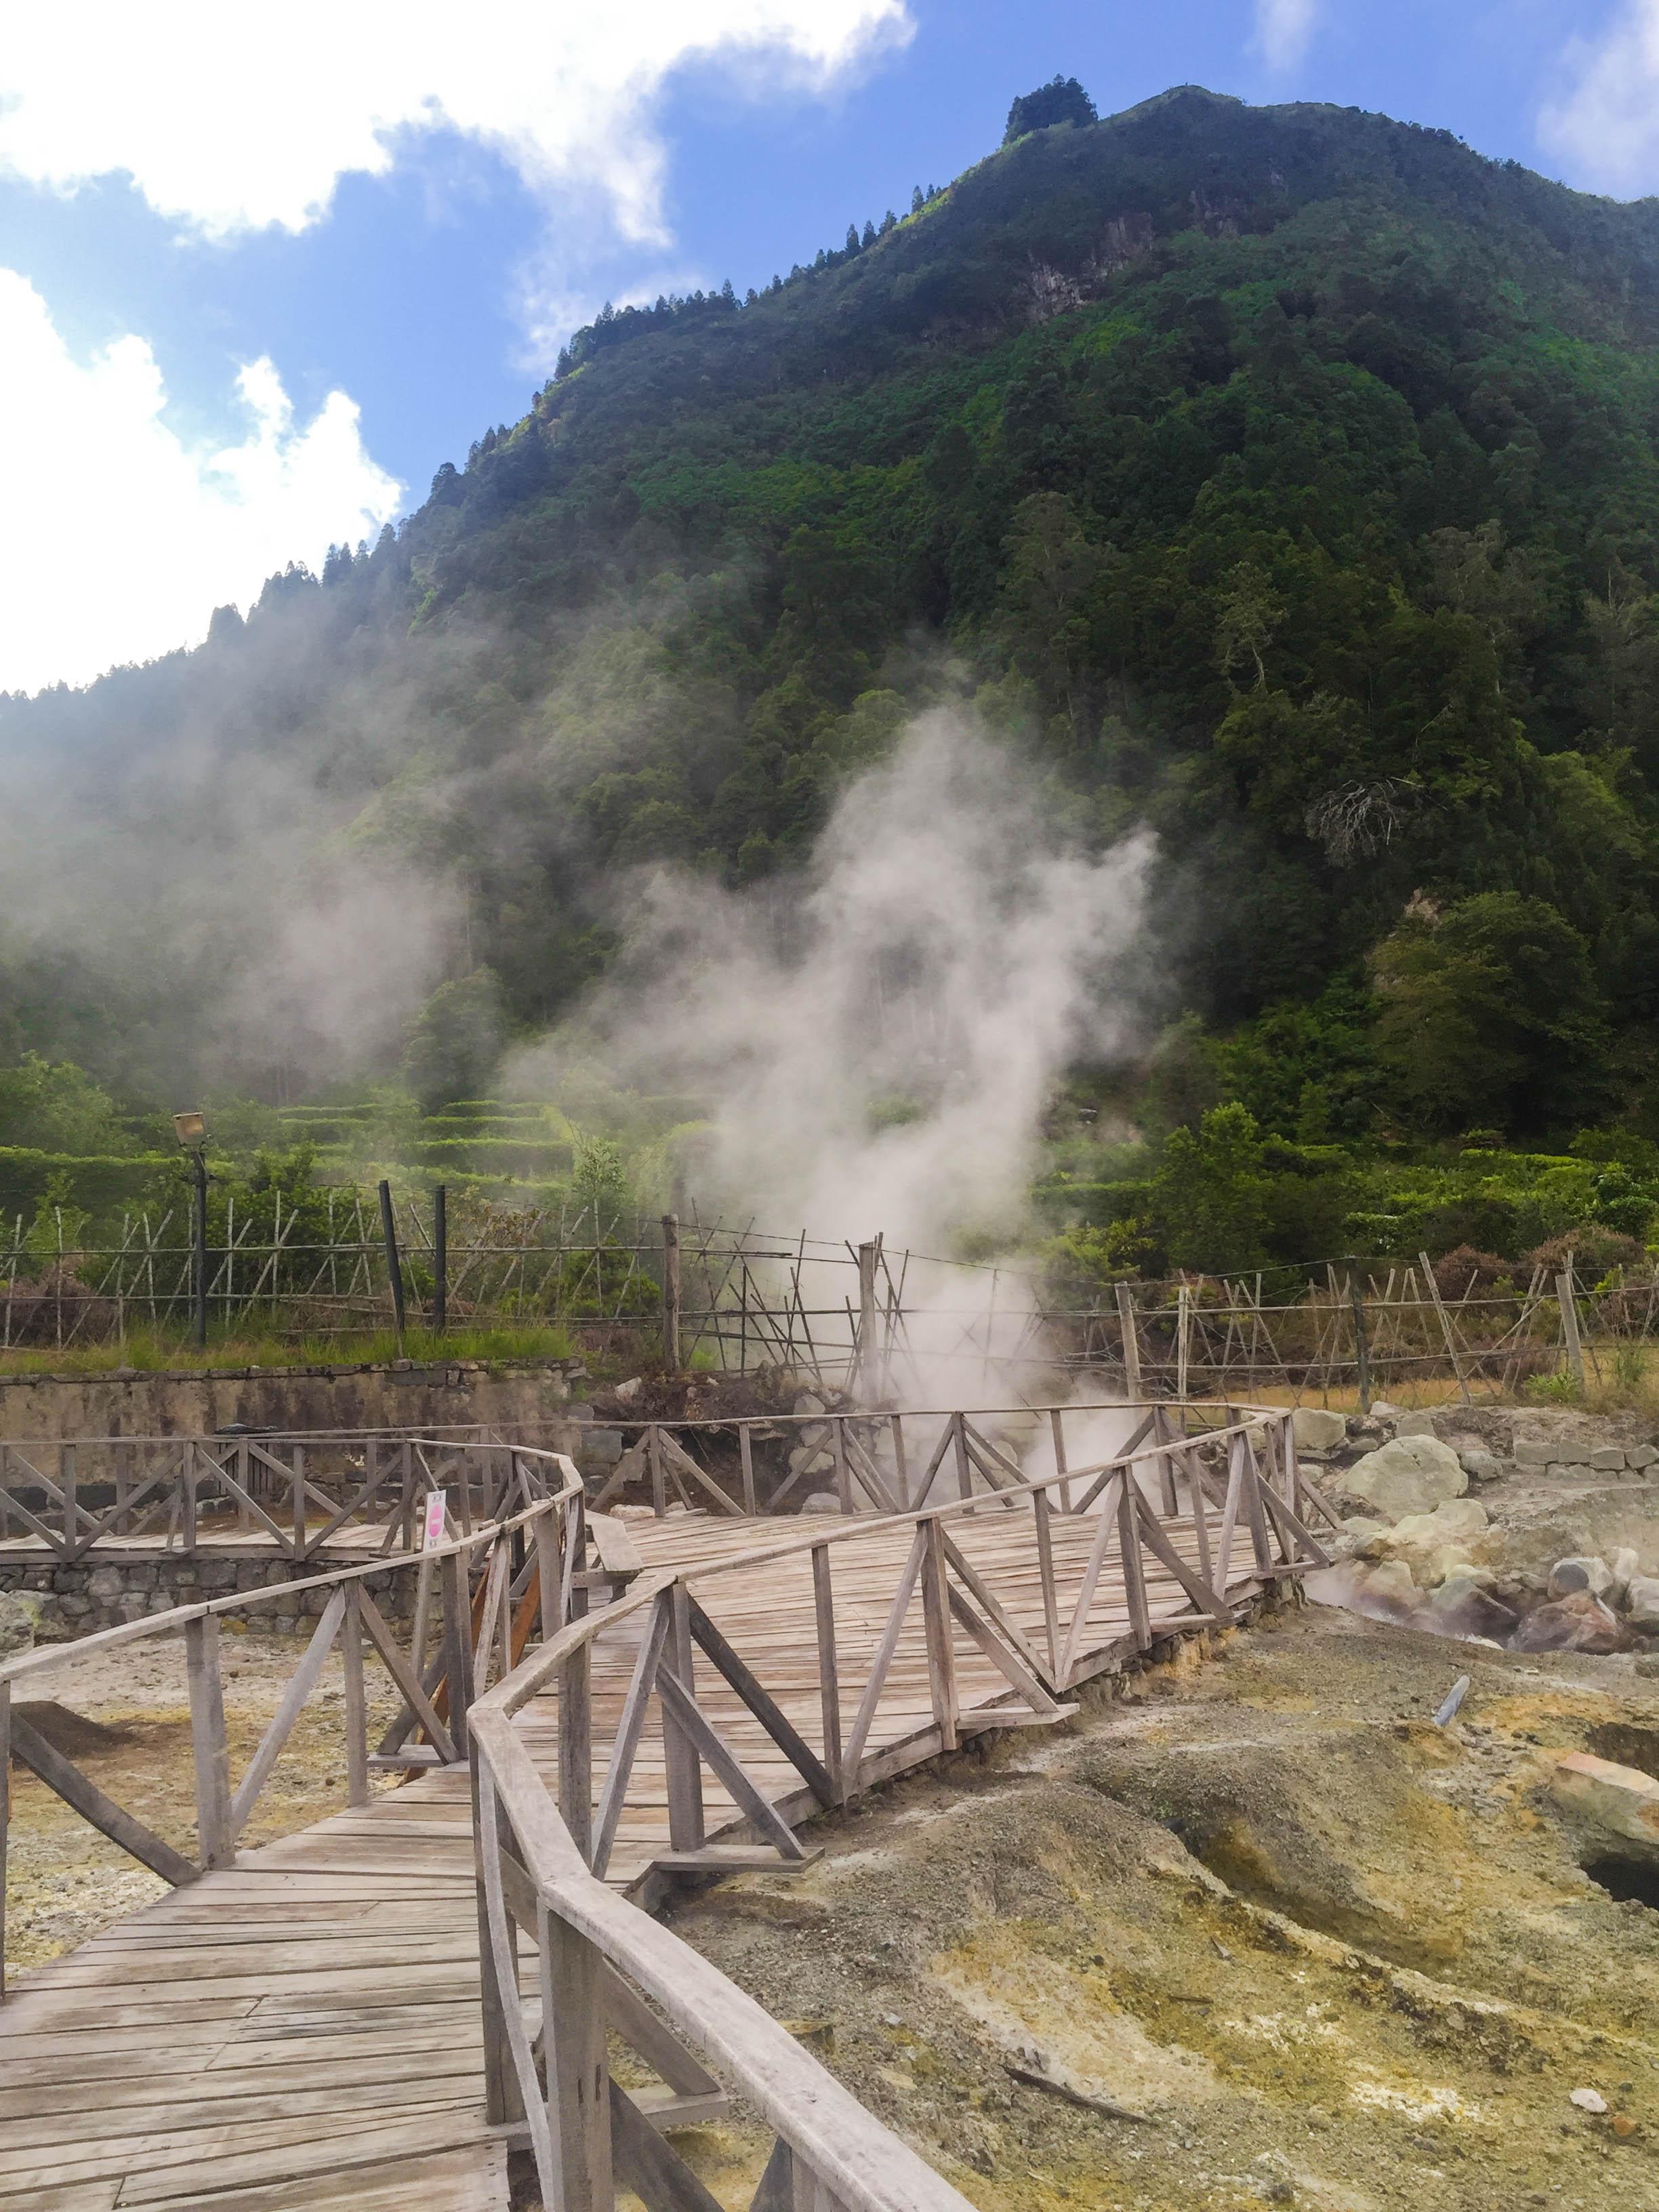 The natural cooking stove of Cozido das Furnas